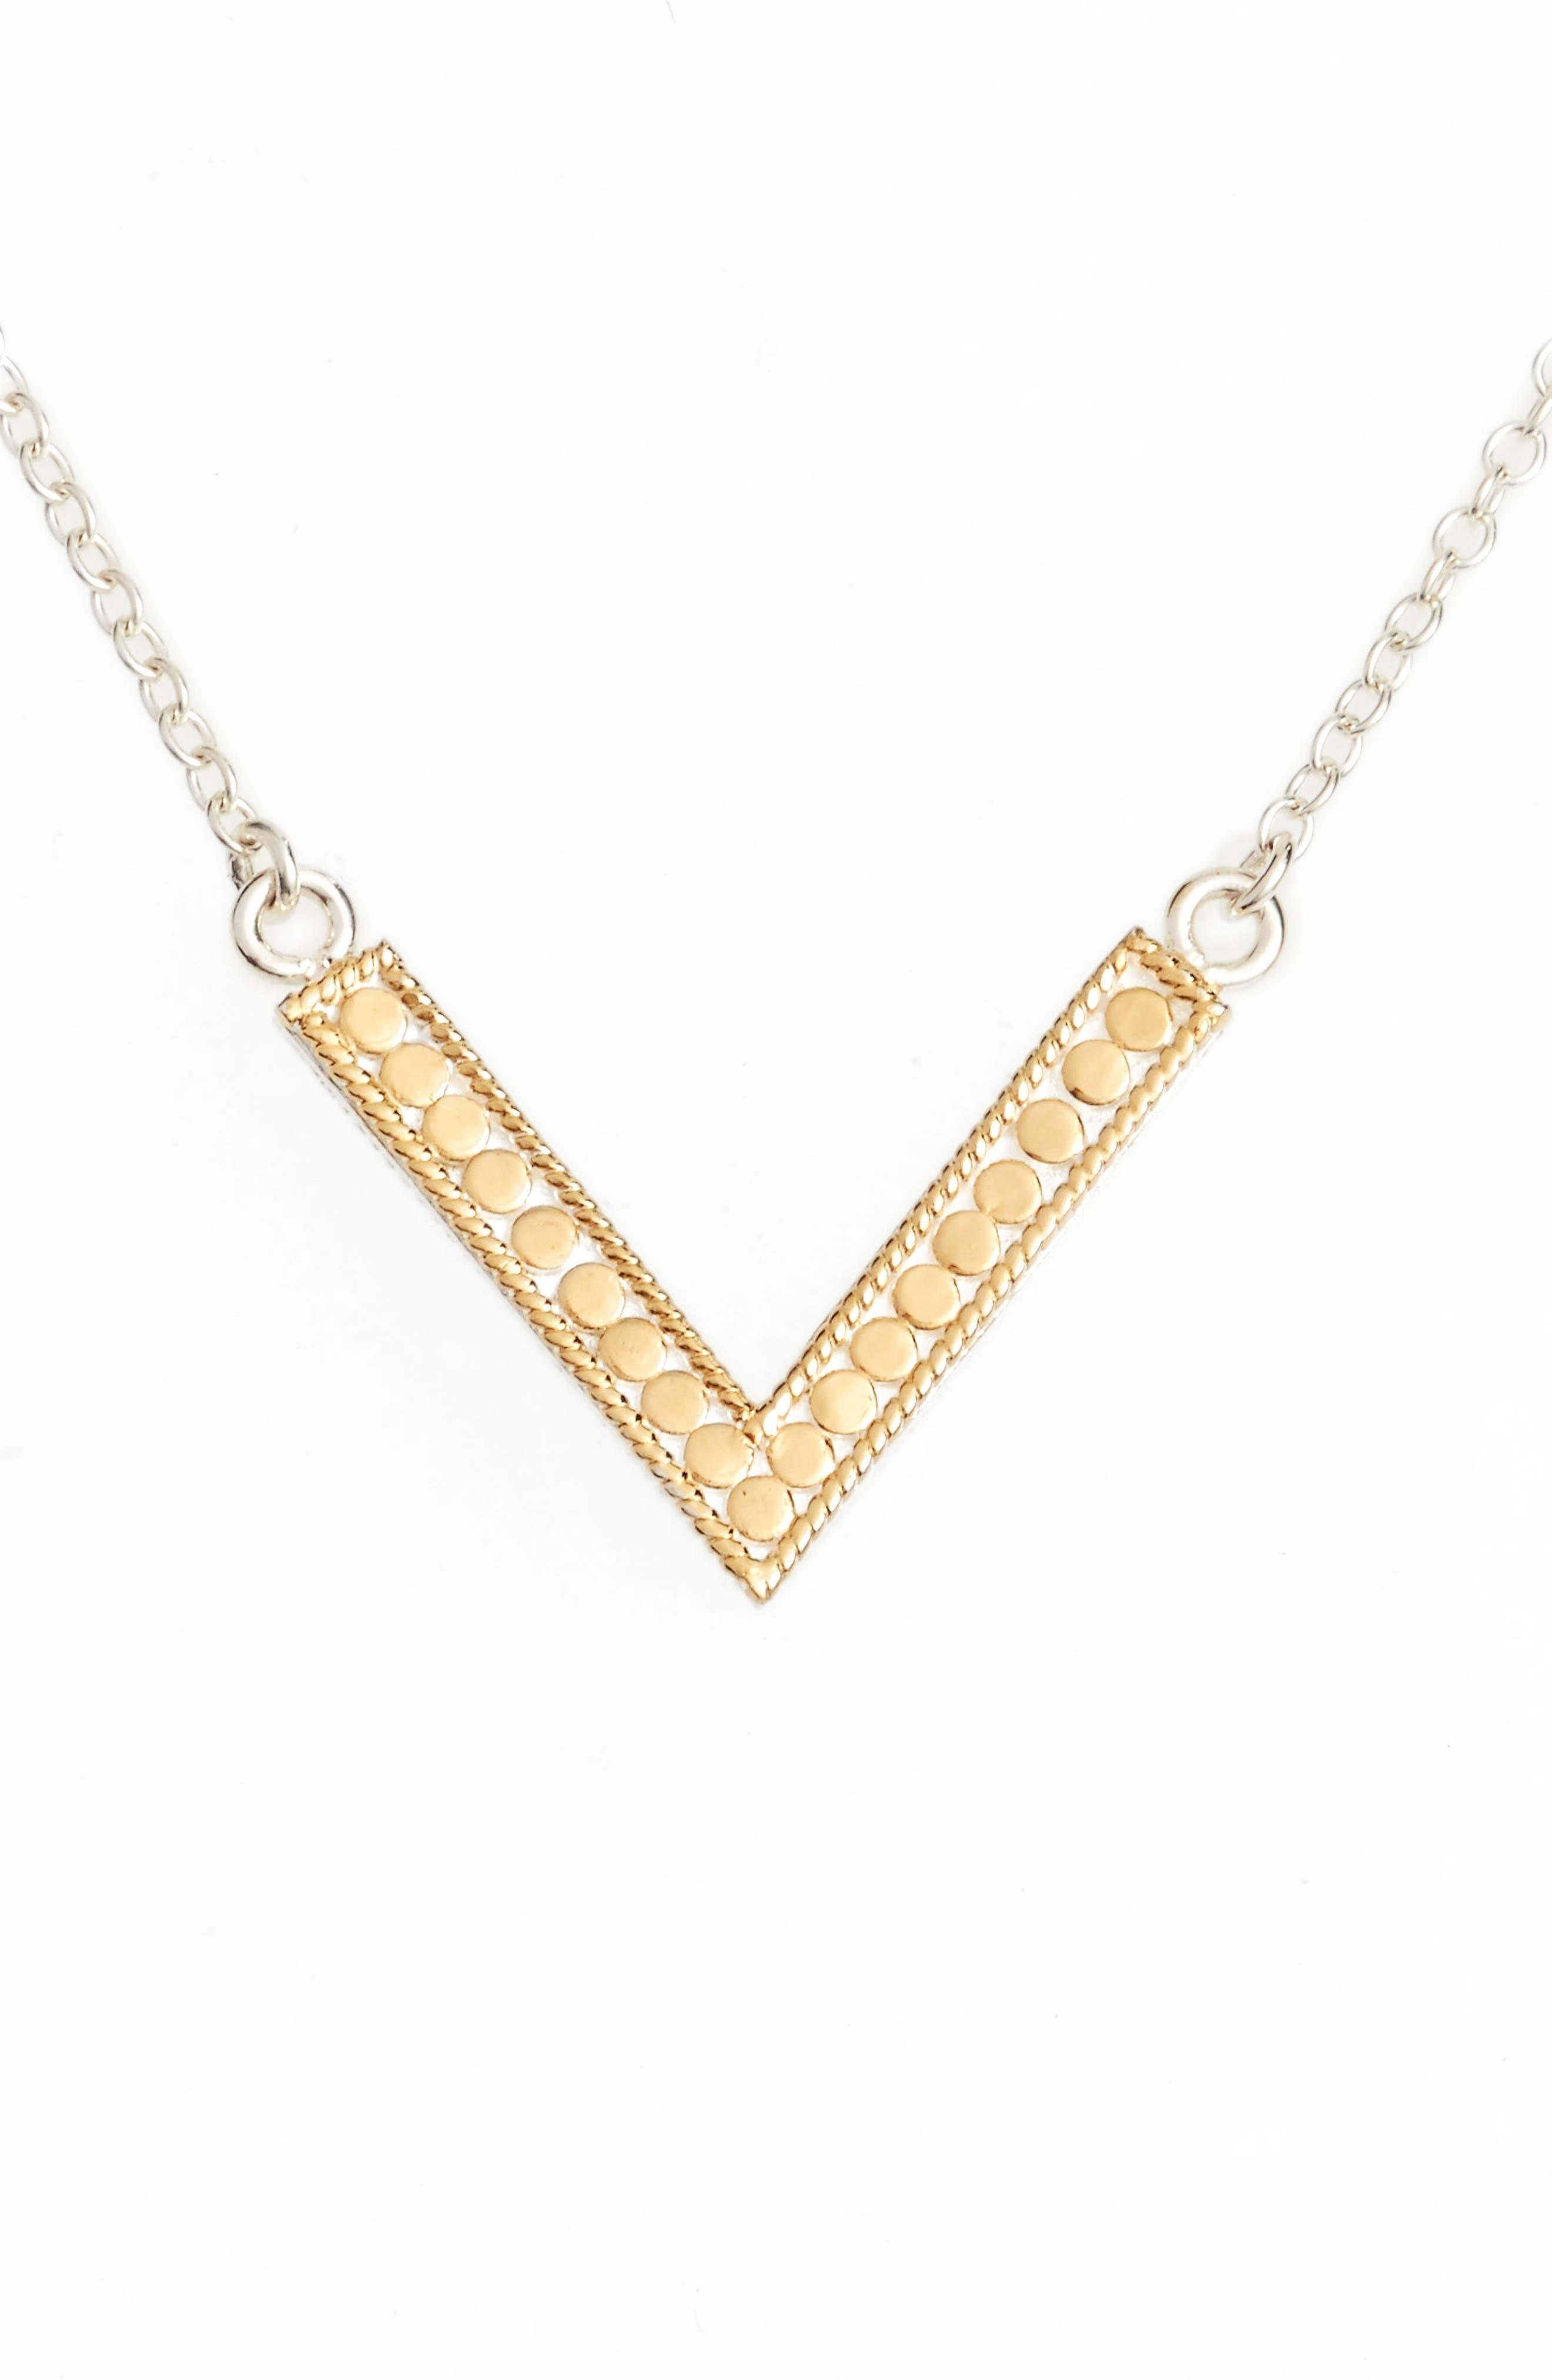 Main Image - Anna Beck Reversible V Necklace